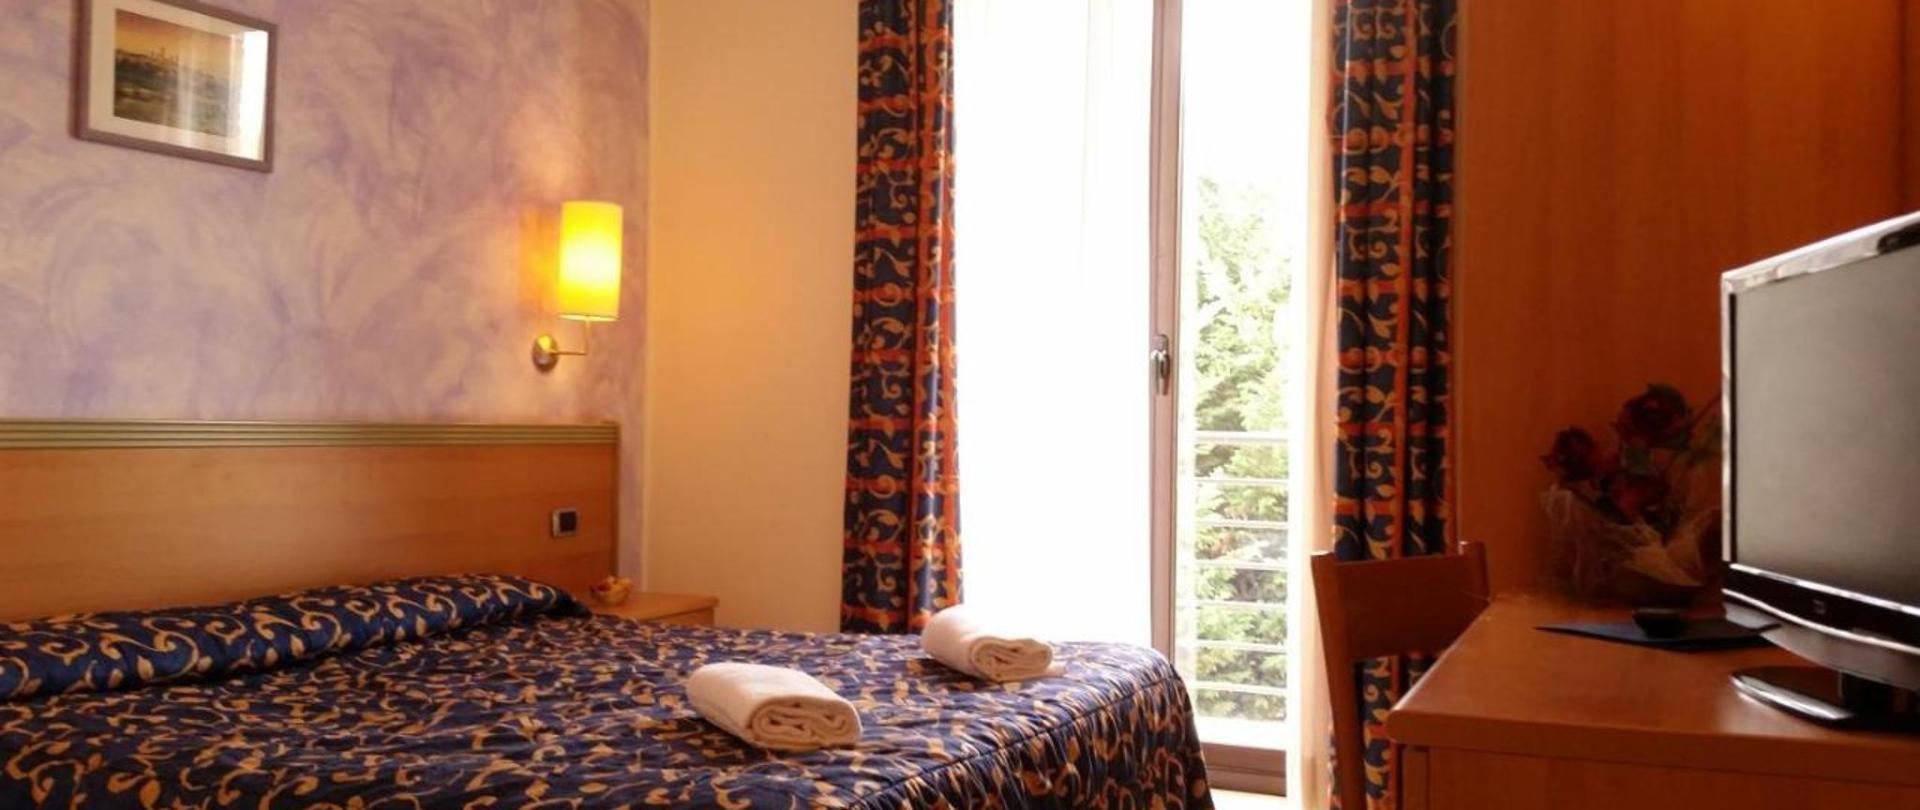 Palace Hotel Due Ponti